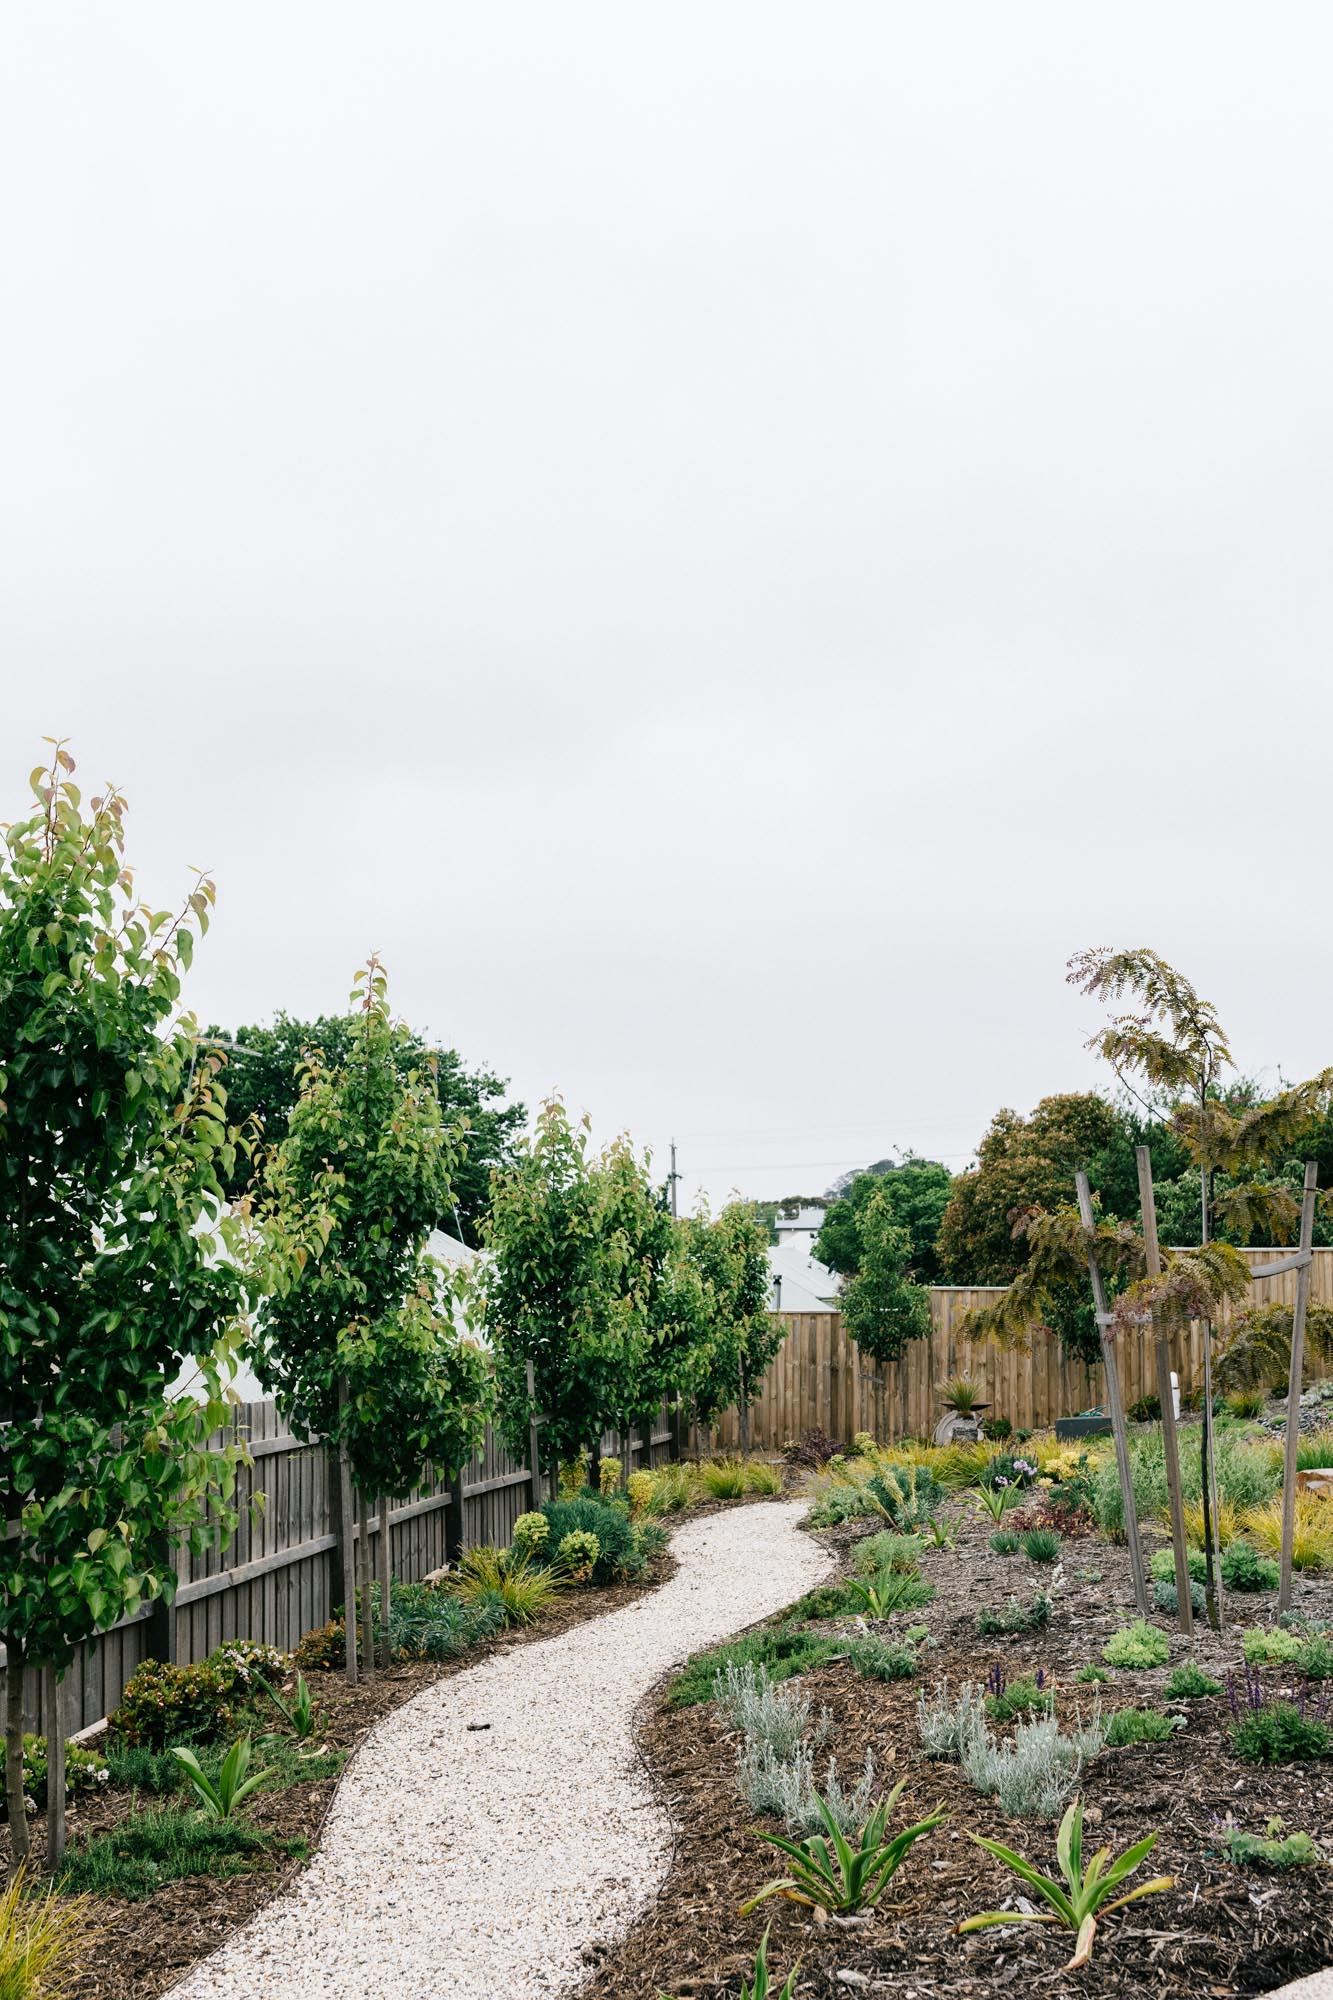 Kathleen Murphy Landscape Design - Gisborne VIC. Photography by Melbourne lifestyle photographer Marnie Hawson.